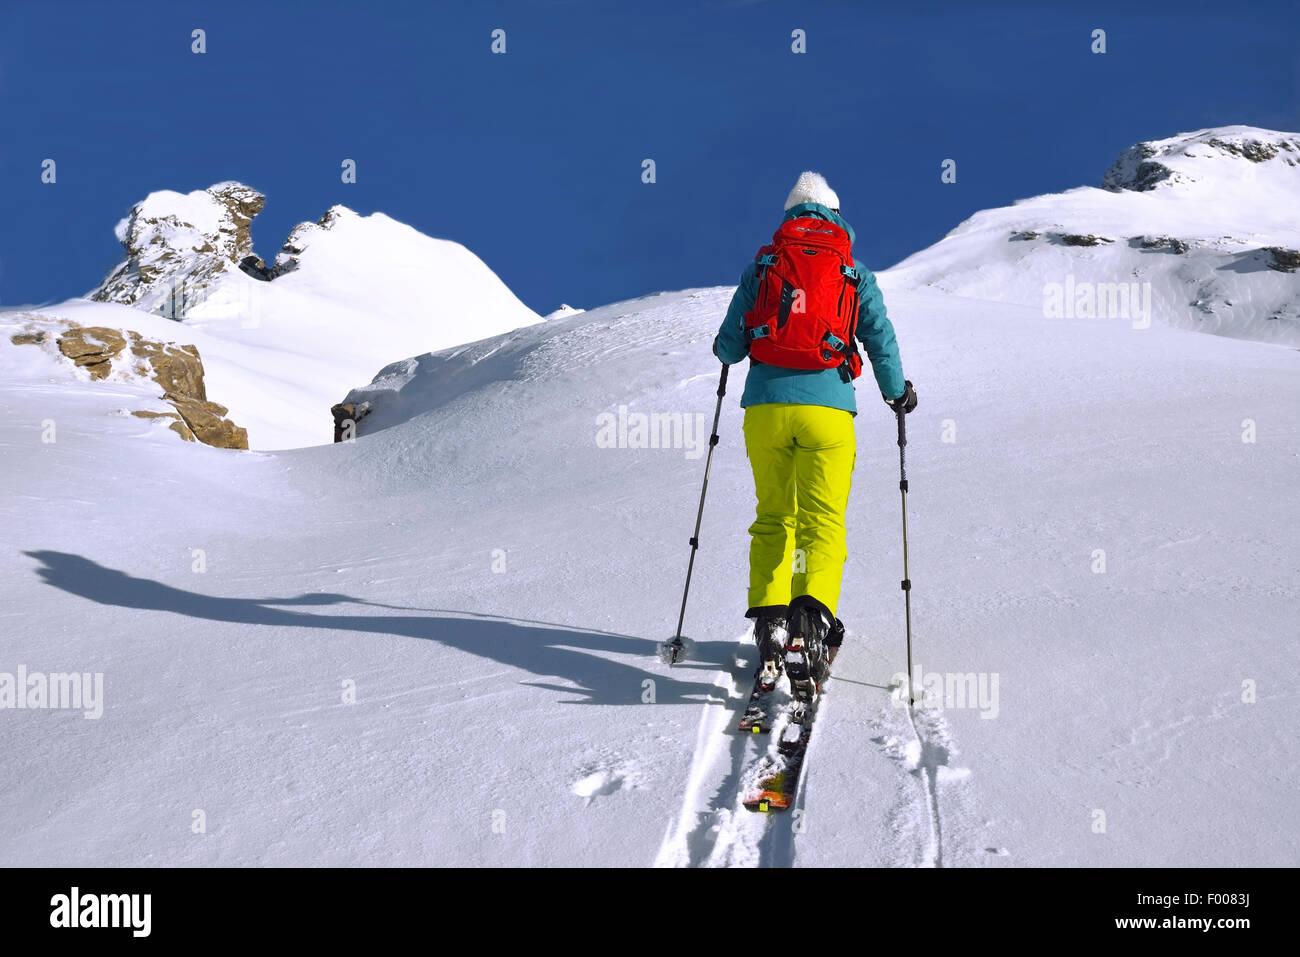 ski touring in snow-covered Alps, France, Savoie, Sainte Foy - Stock Image